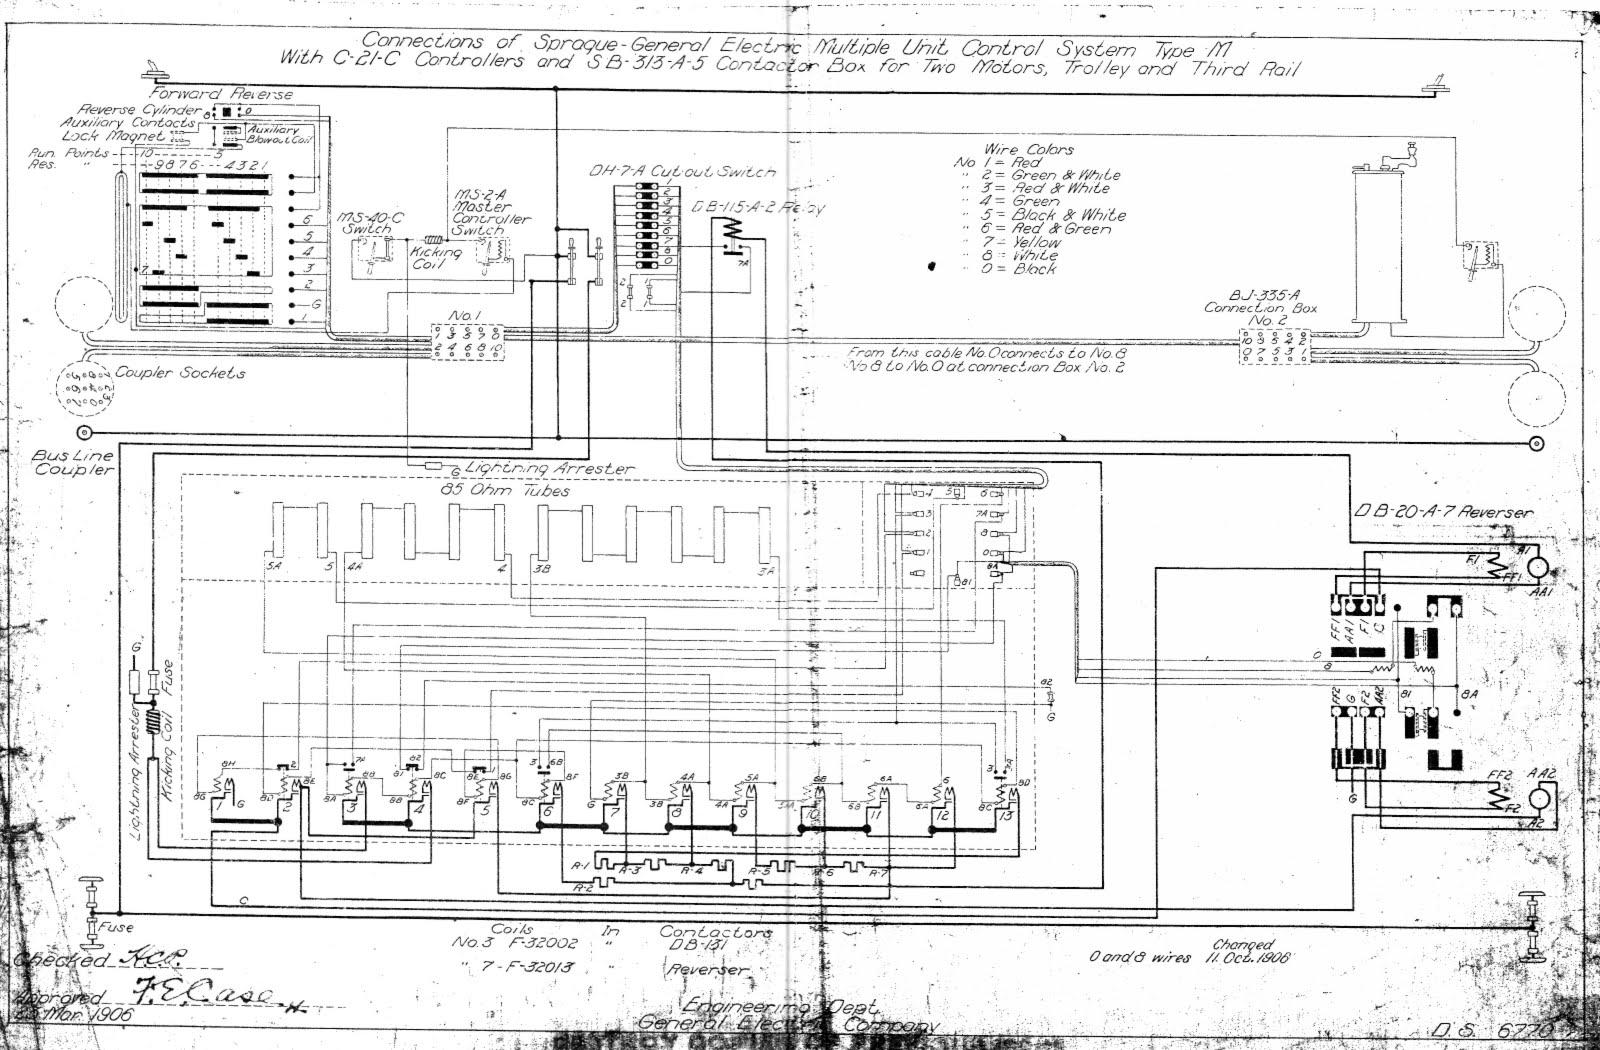 tata aria wiring diagram